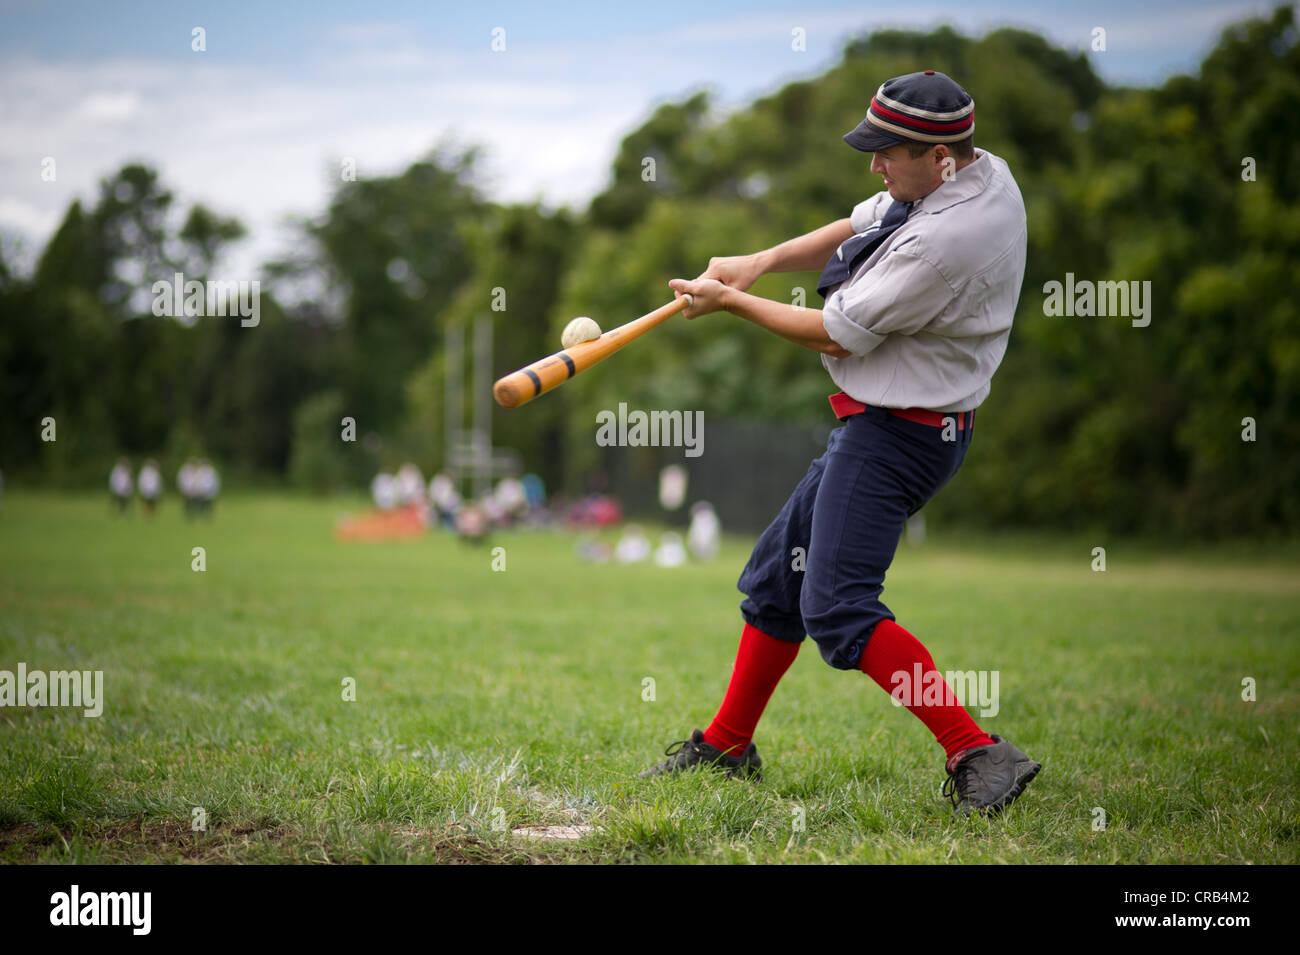 Men playing a game of Vintage Base Ball - Stock Image